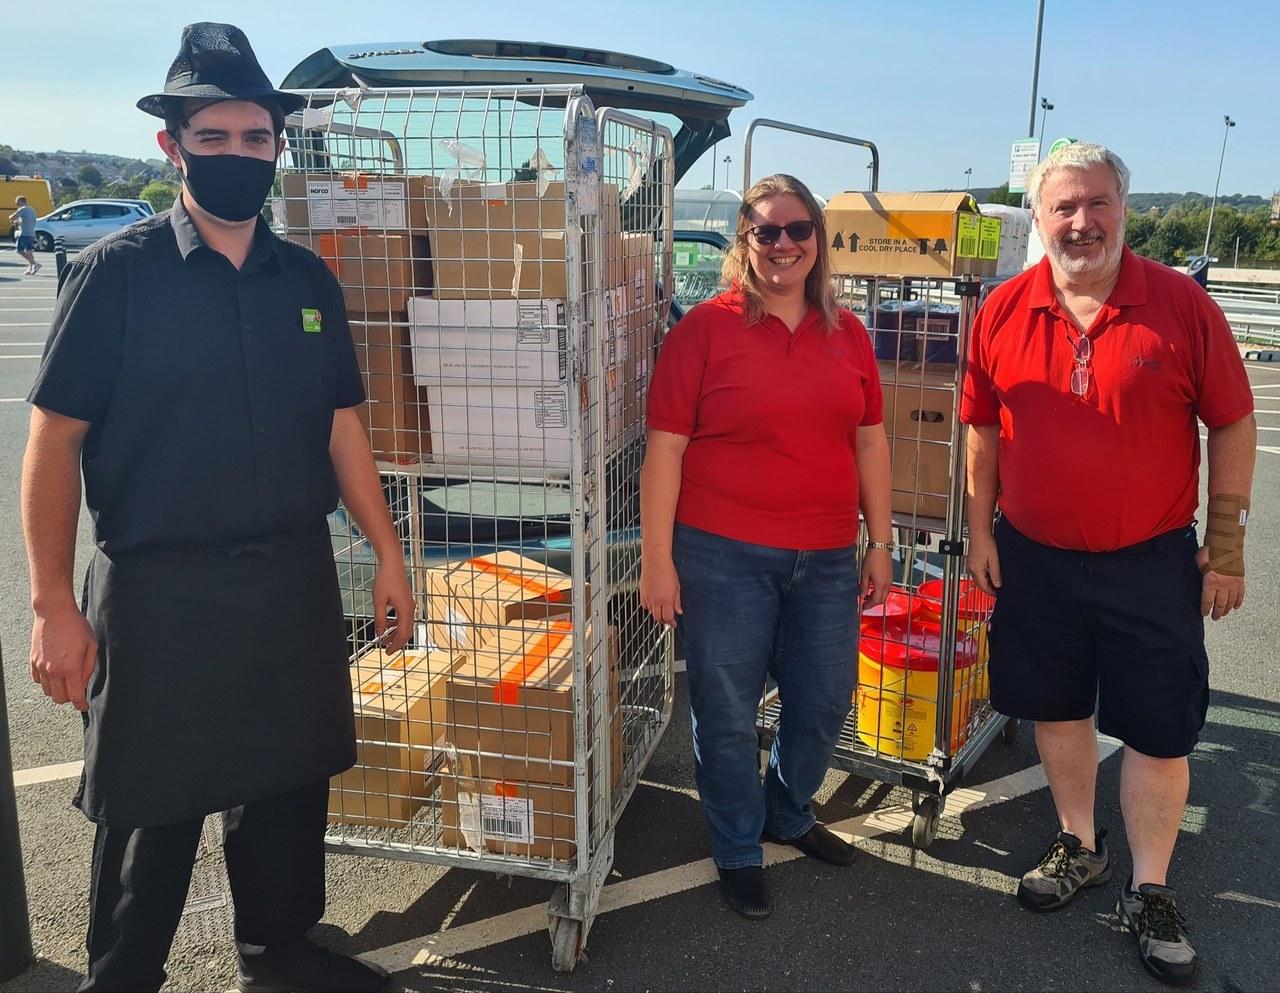 Salvation Army donation | Asda Newport Isle of Wight